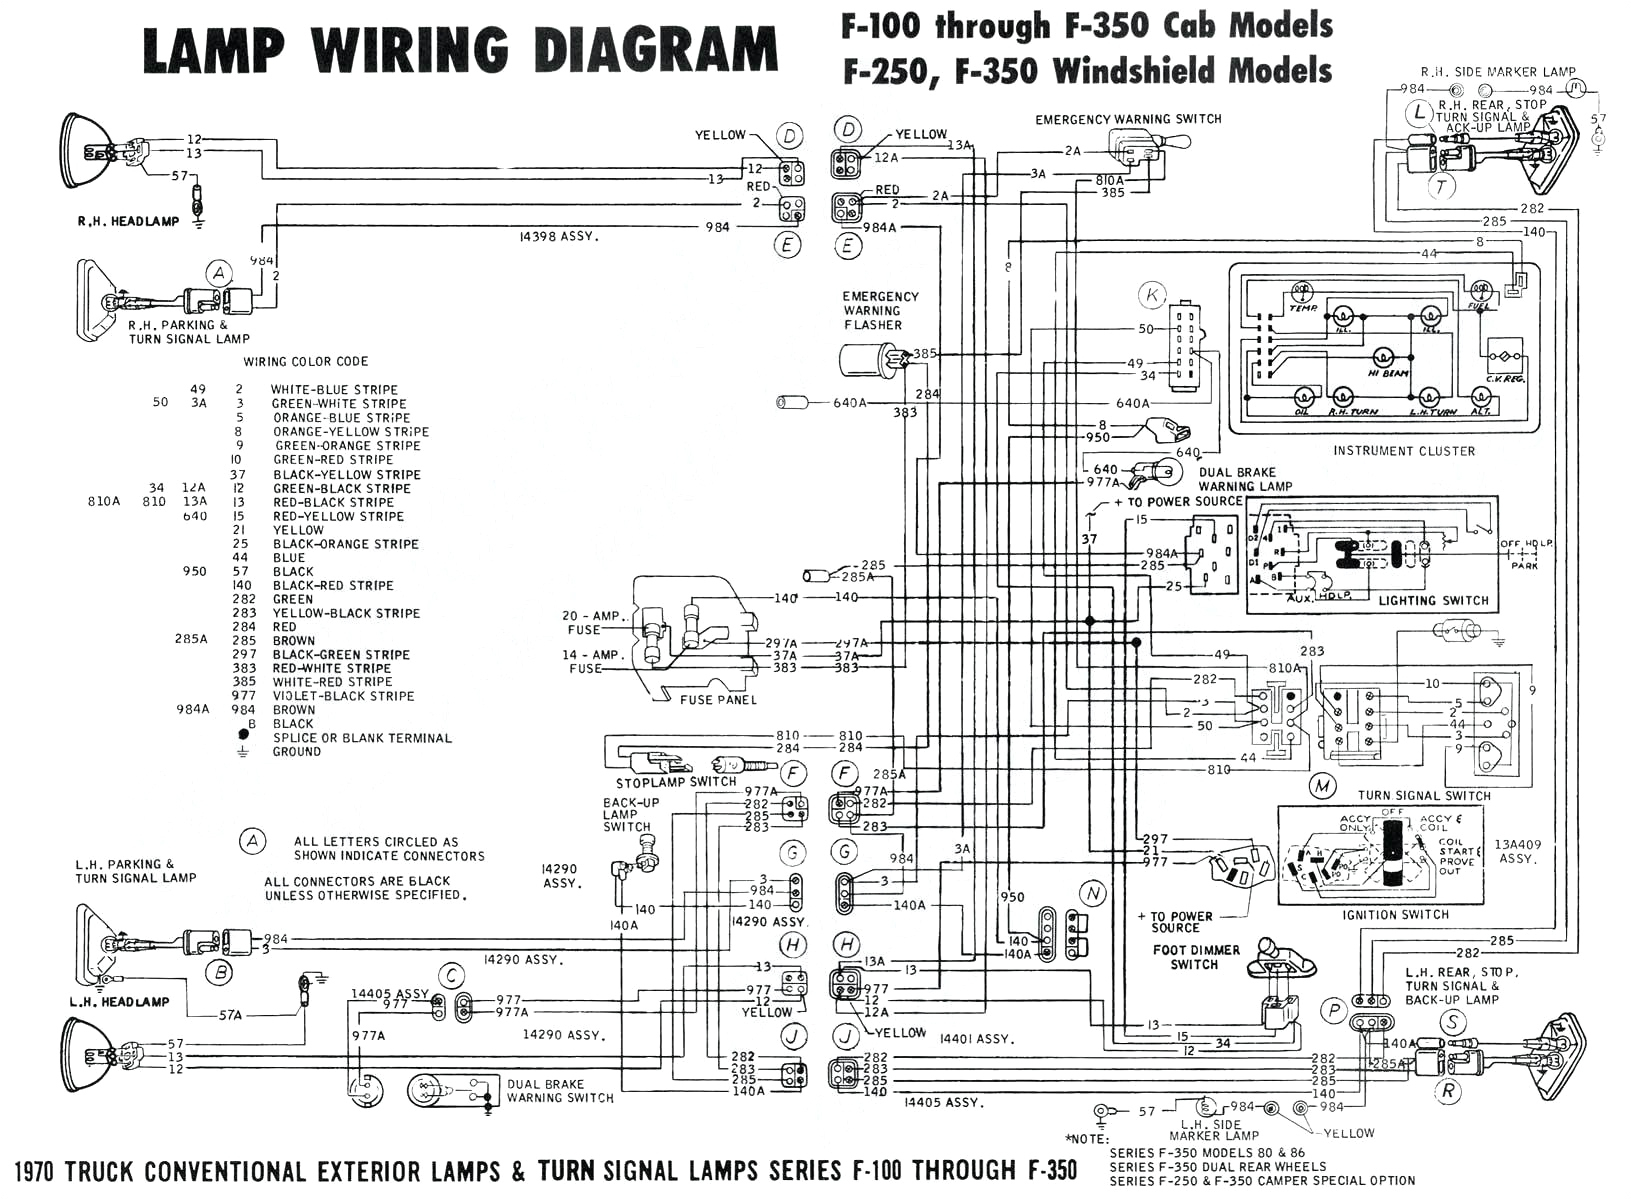 pioneer deh x6800bt wiring diagram rv plug wiring diagram best national trailer wiring diagram refrence rv wiring diagrams coachman 4s jpg